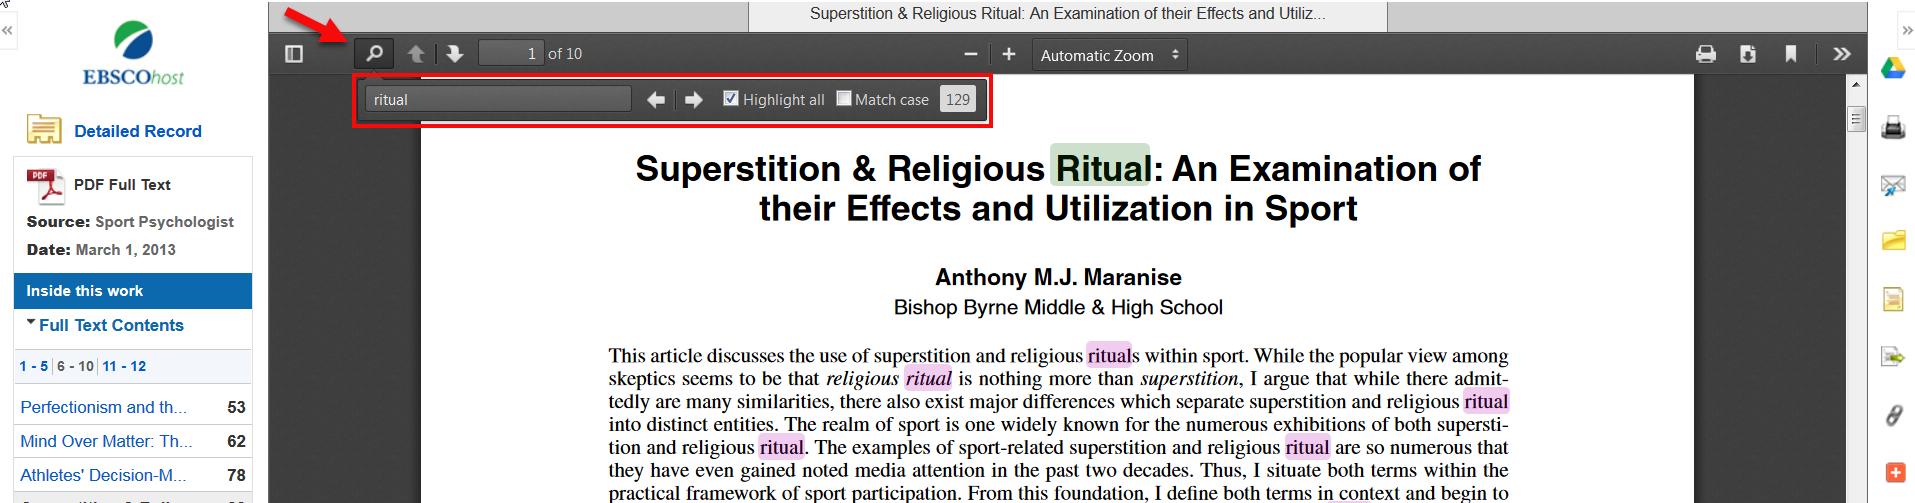 Search inside a PDF article